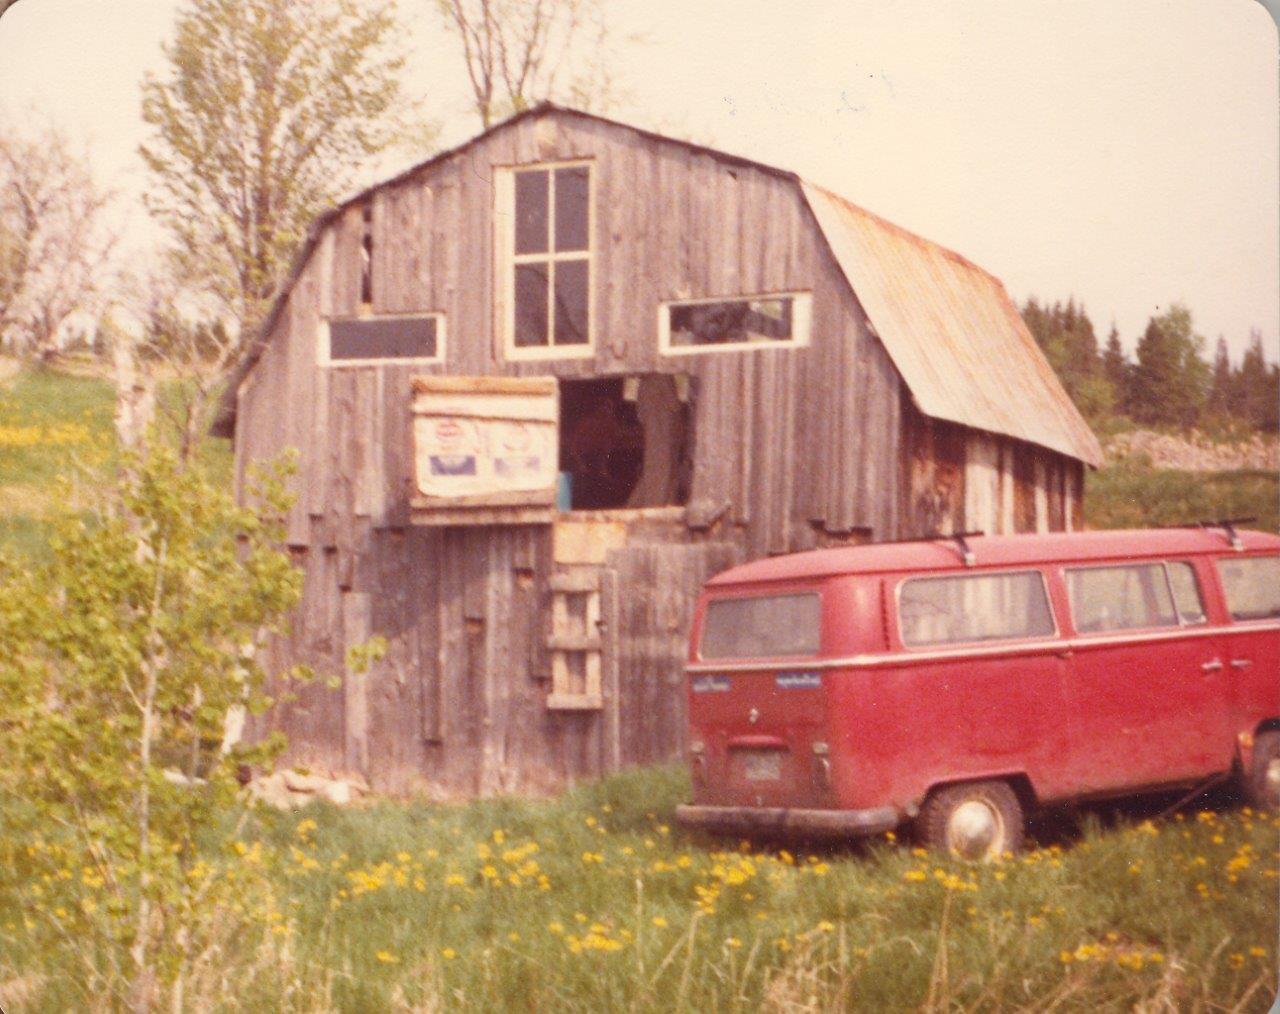 198005xx-ra-003-Robins VW Van At Barn-Randboro